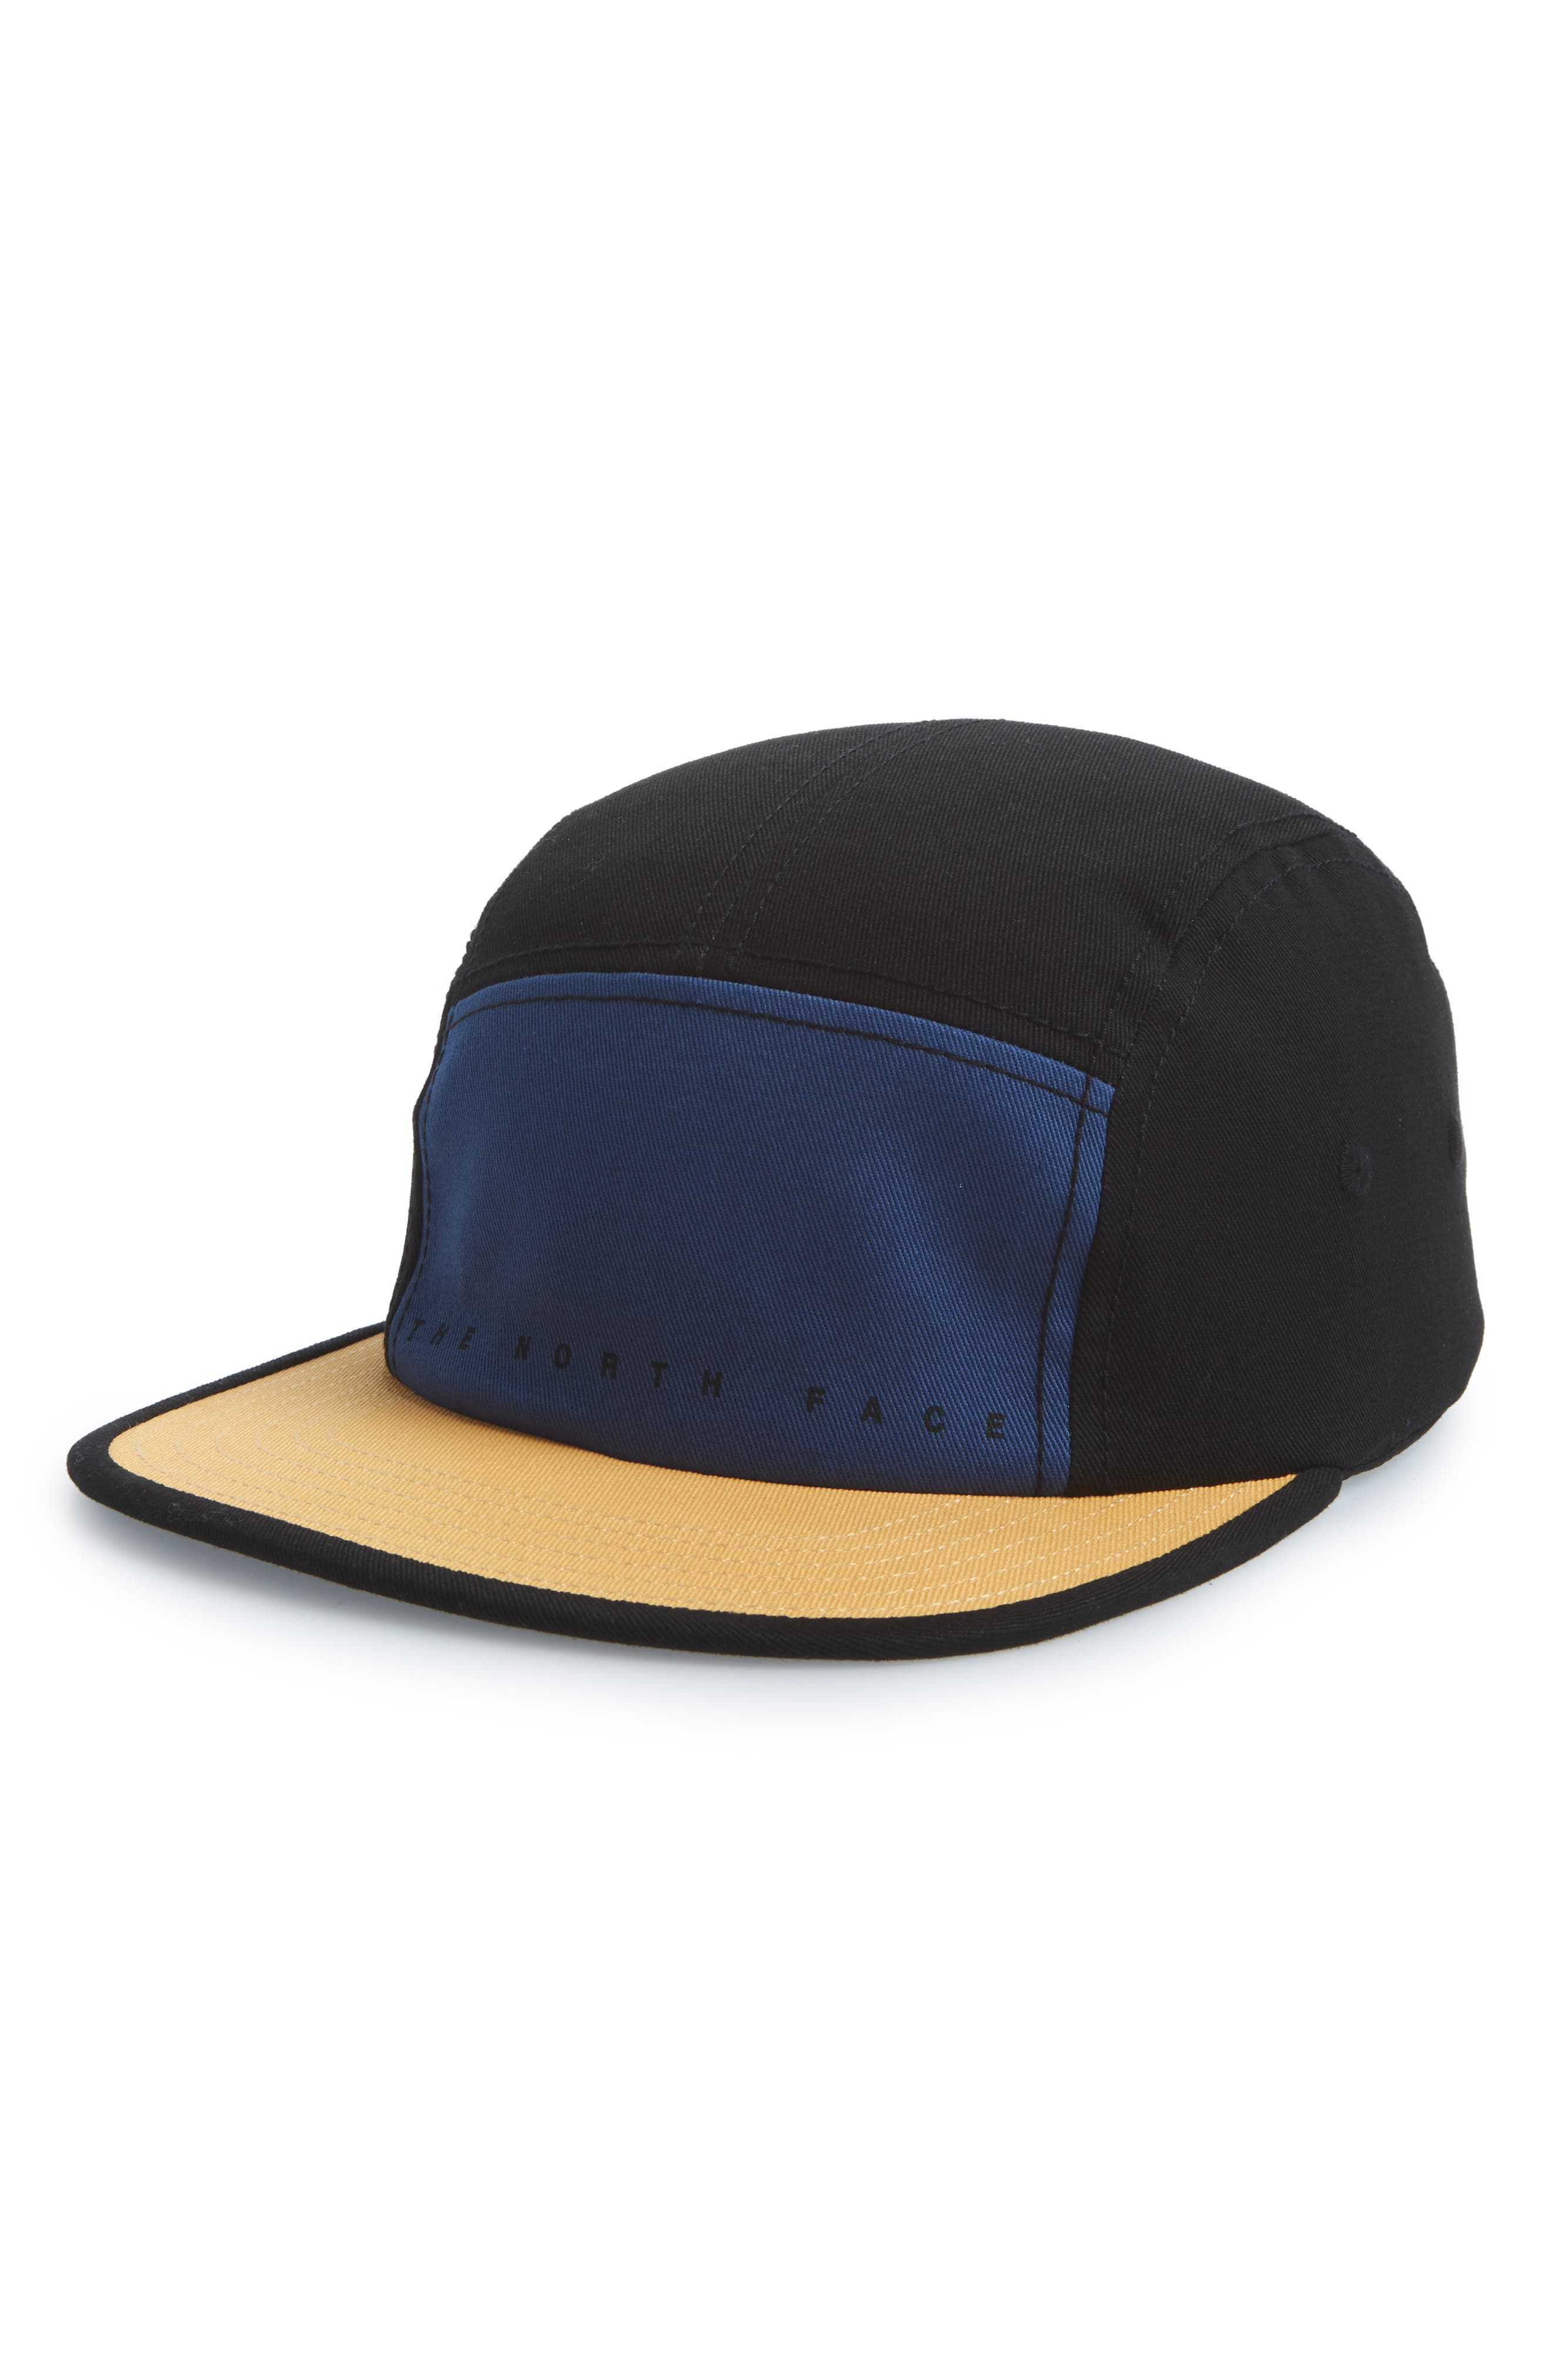 Five-Panel Baseball Cap,                         Main,                         color, Dish Blue/ Black/ Amber